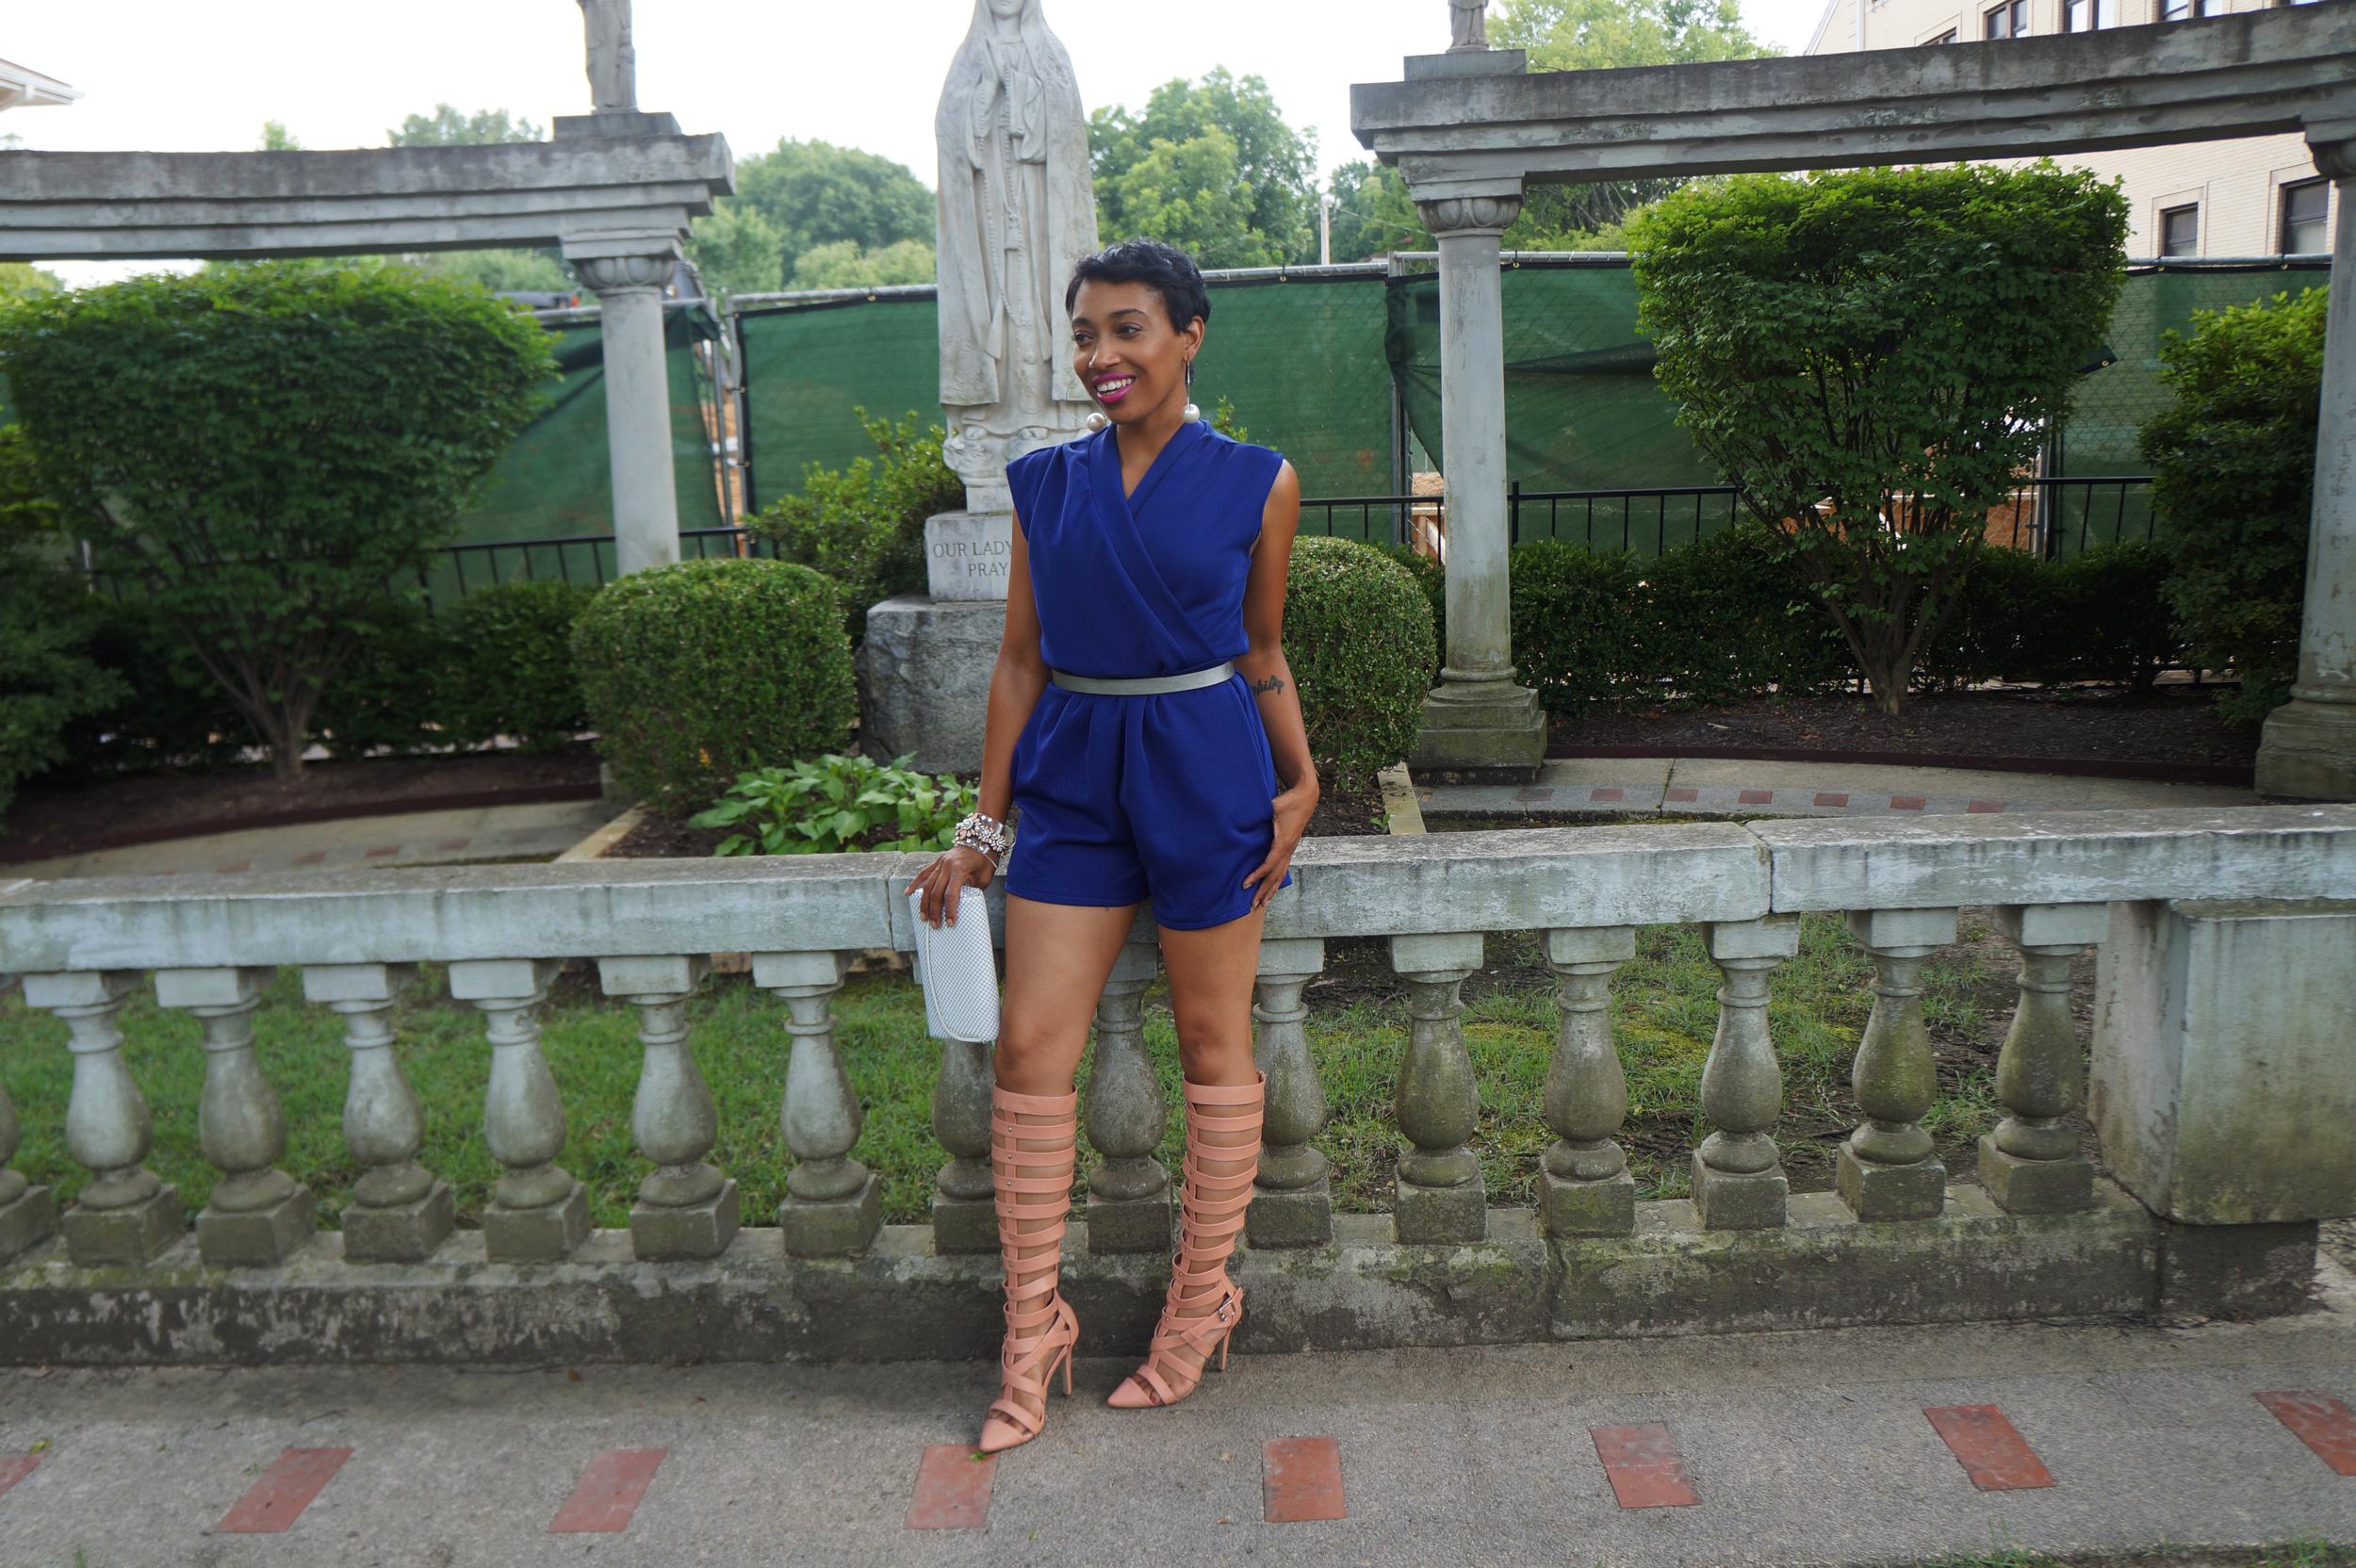 Andrea Fenise Memphis Fashion Blogger turns a room into a wardrobe